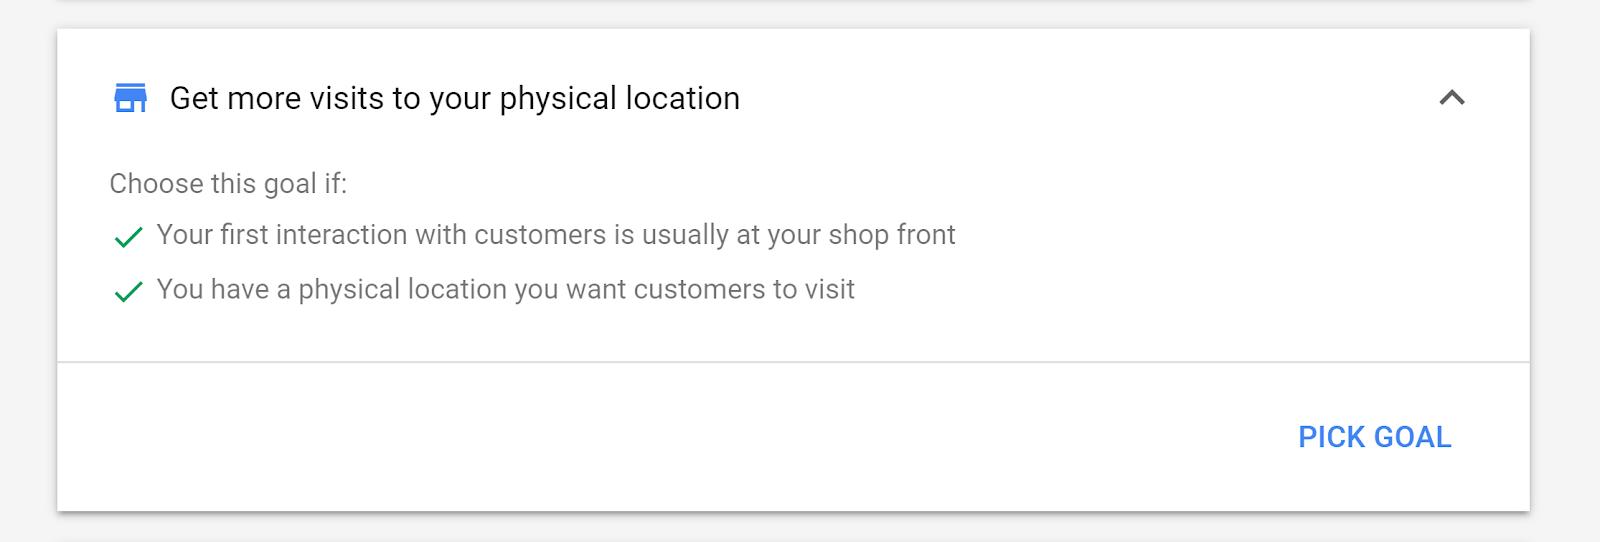 Google Ads Smart Campaign - Step 4